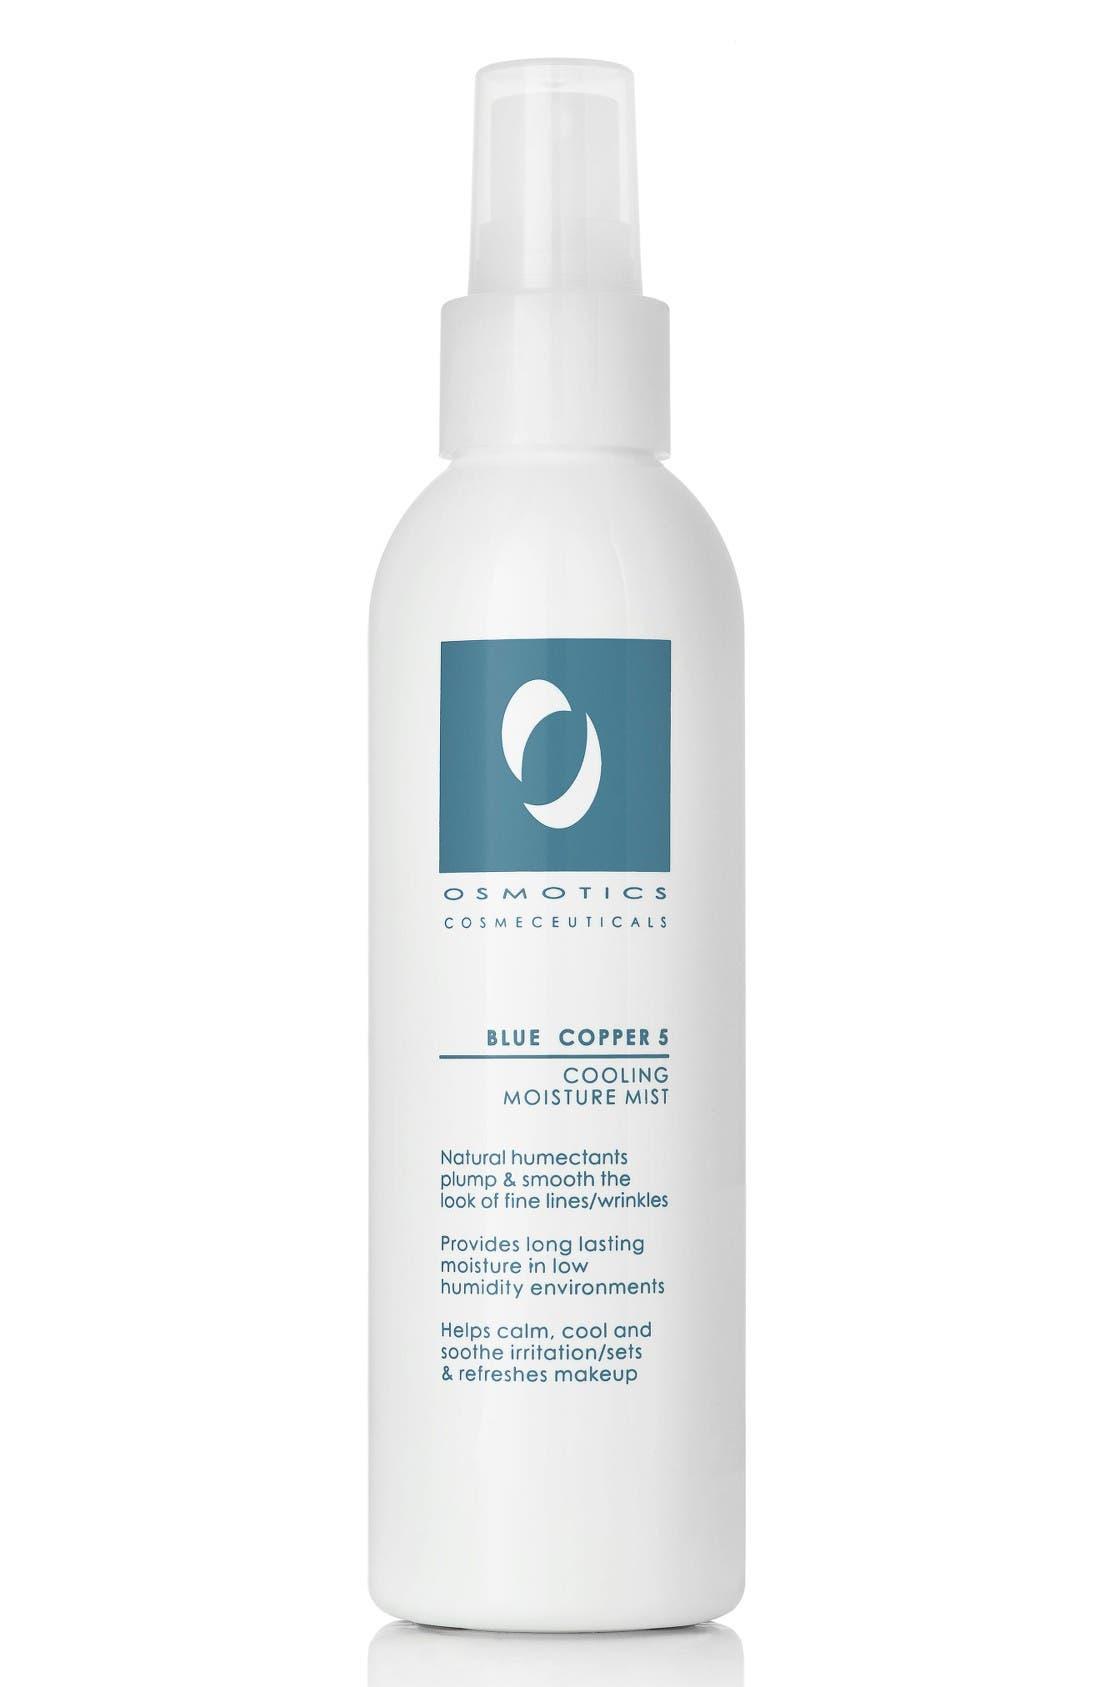 Alternate Image 1 Selected - Osmotics Cosmeceuticals Blue Copper 5 Cooling Moisture Mist